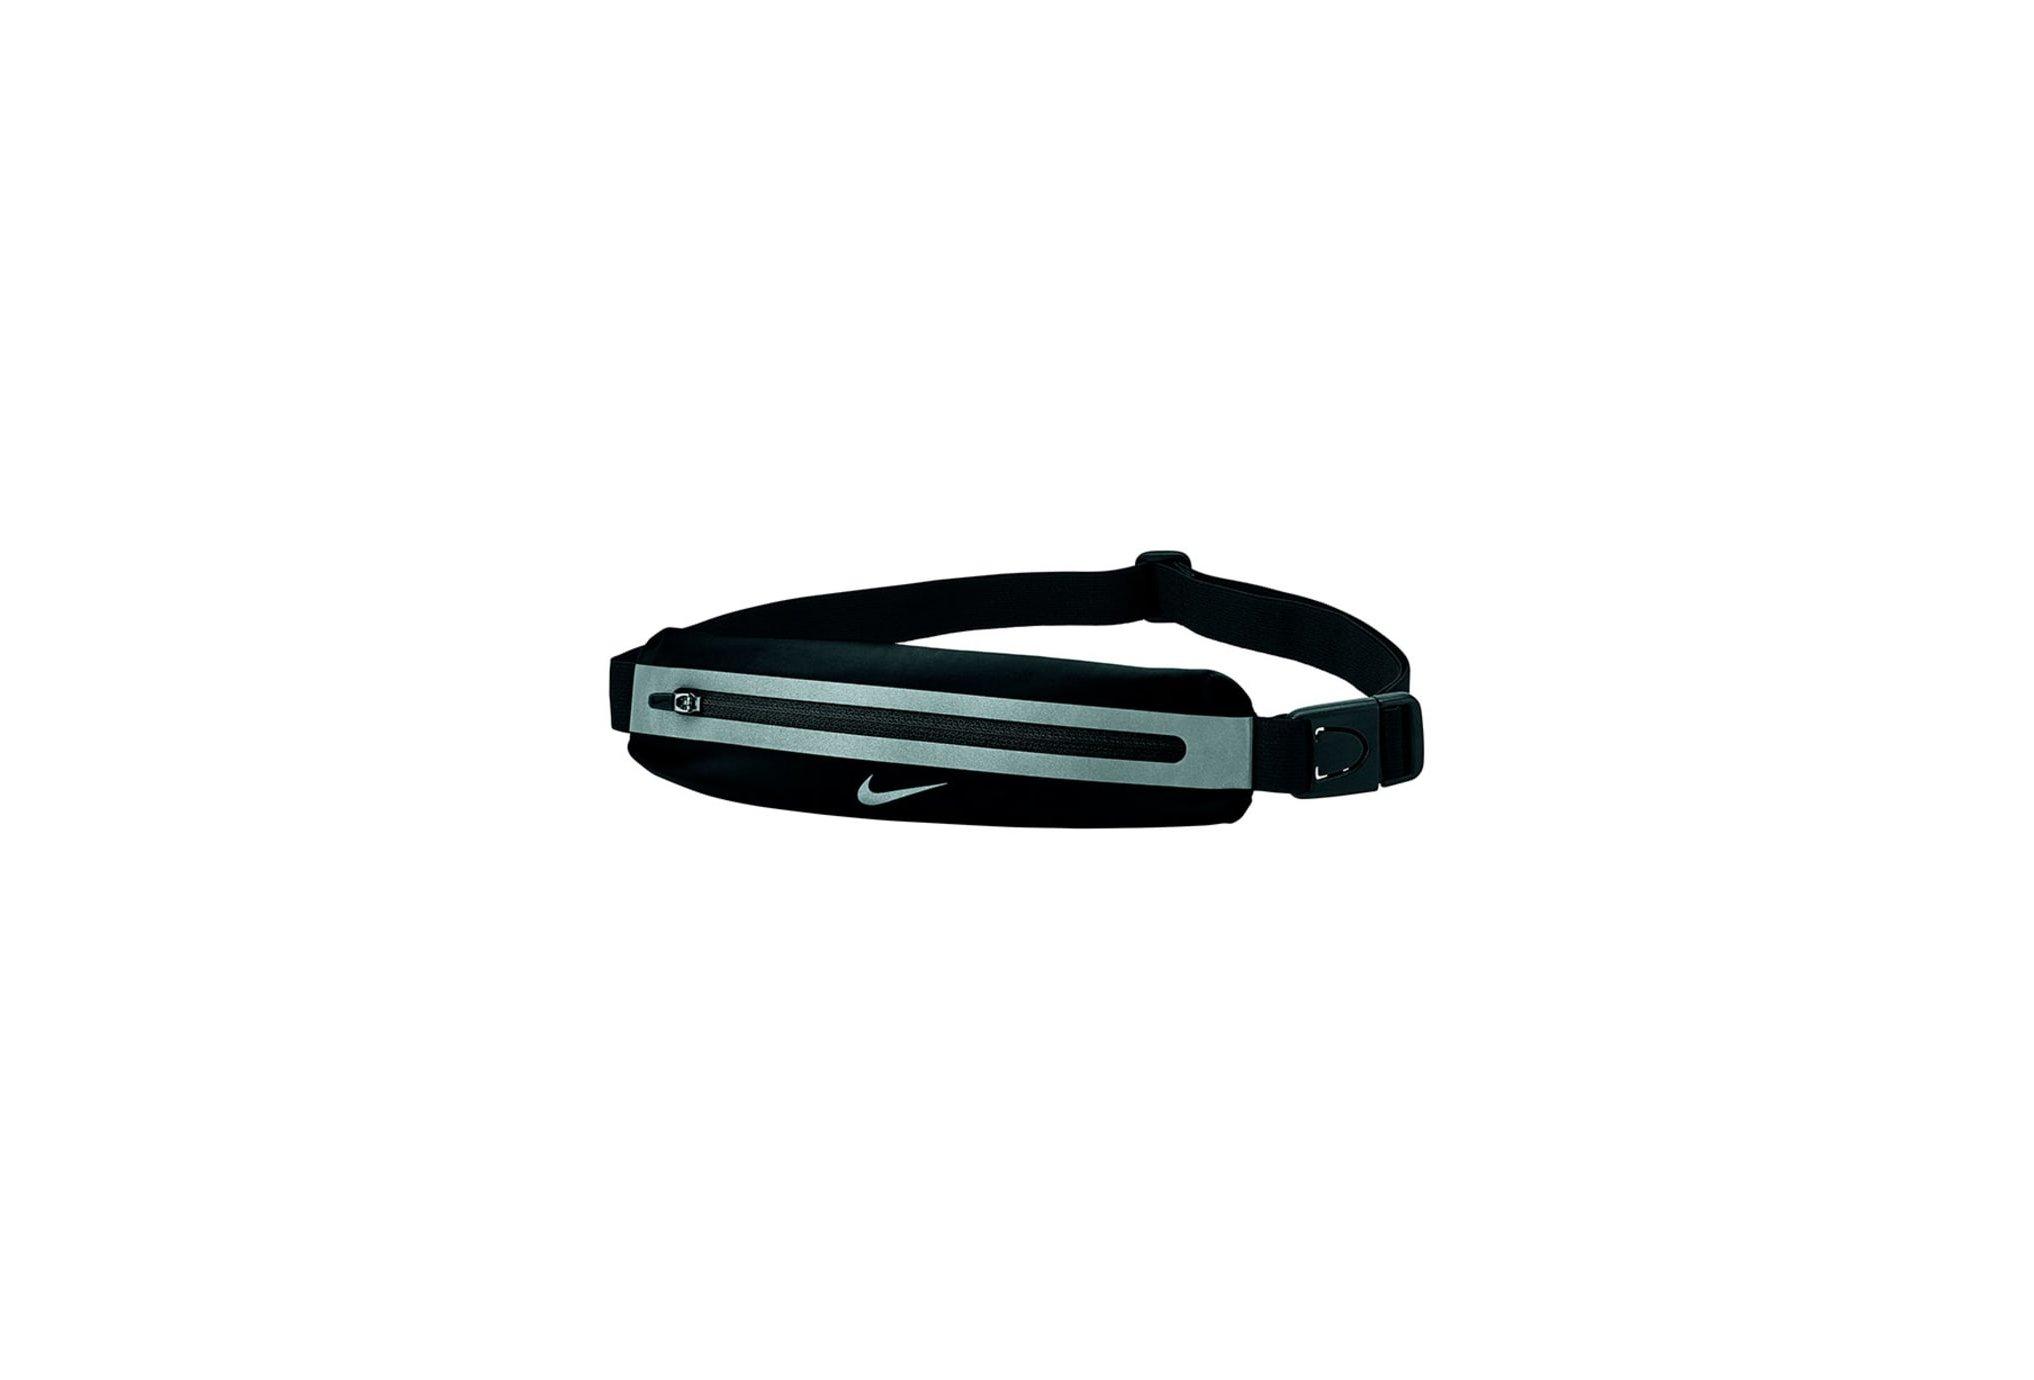 Nike Slim Waistpack Ceinture / porte dossard